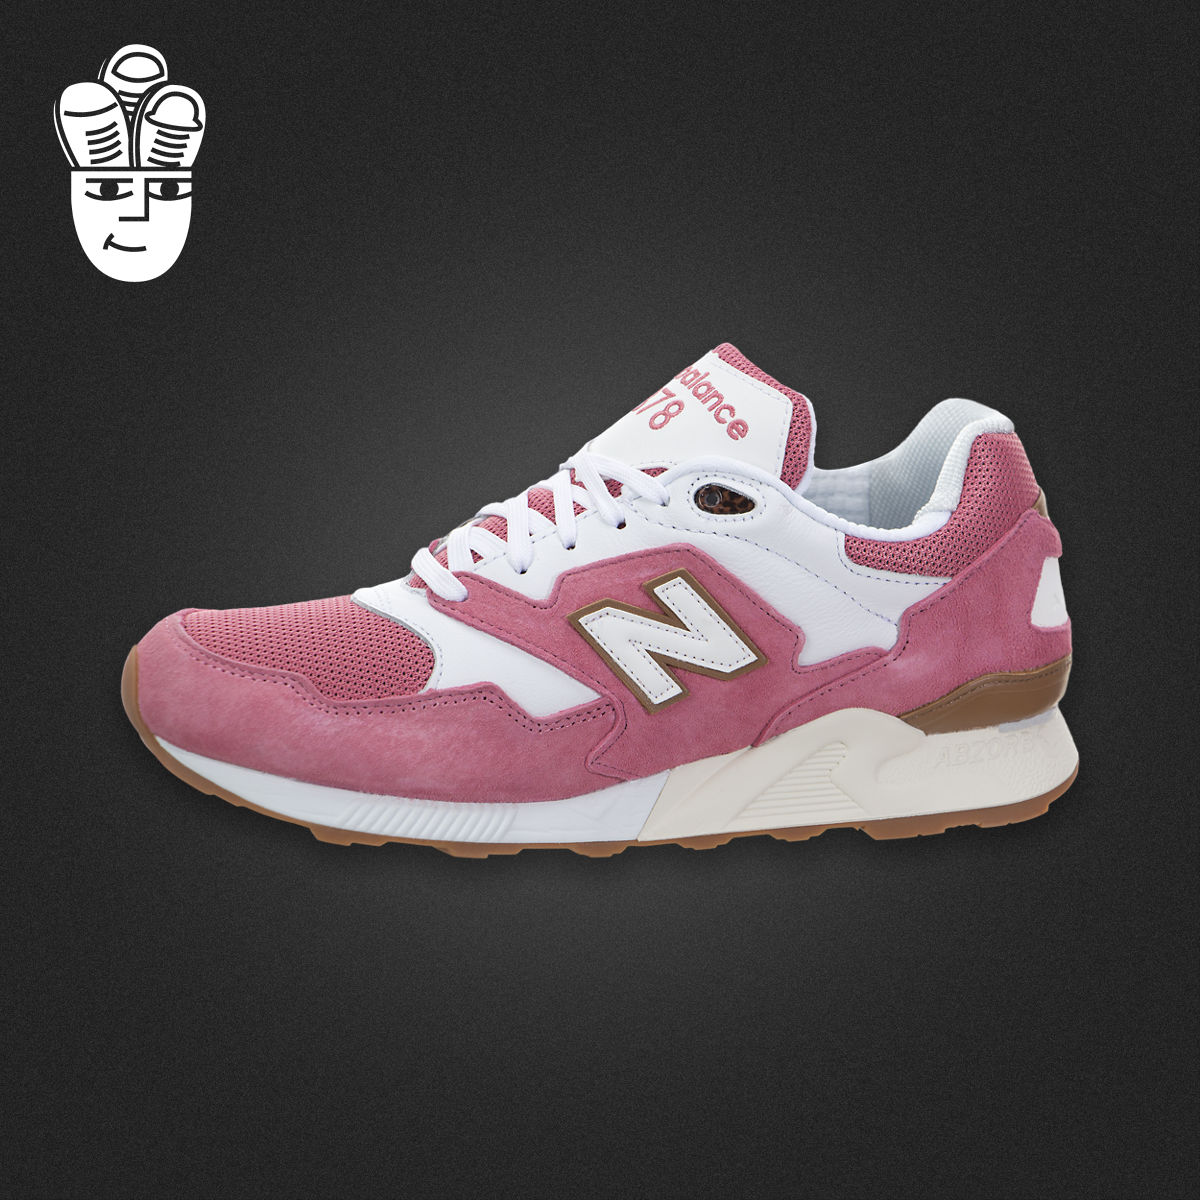 New Balance 878 NB男子经典跑步鞋 慢跑鞋 运动休闲鞋 原白配色